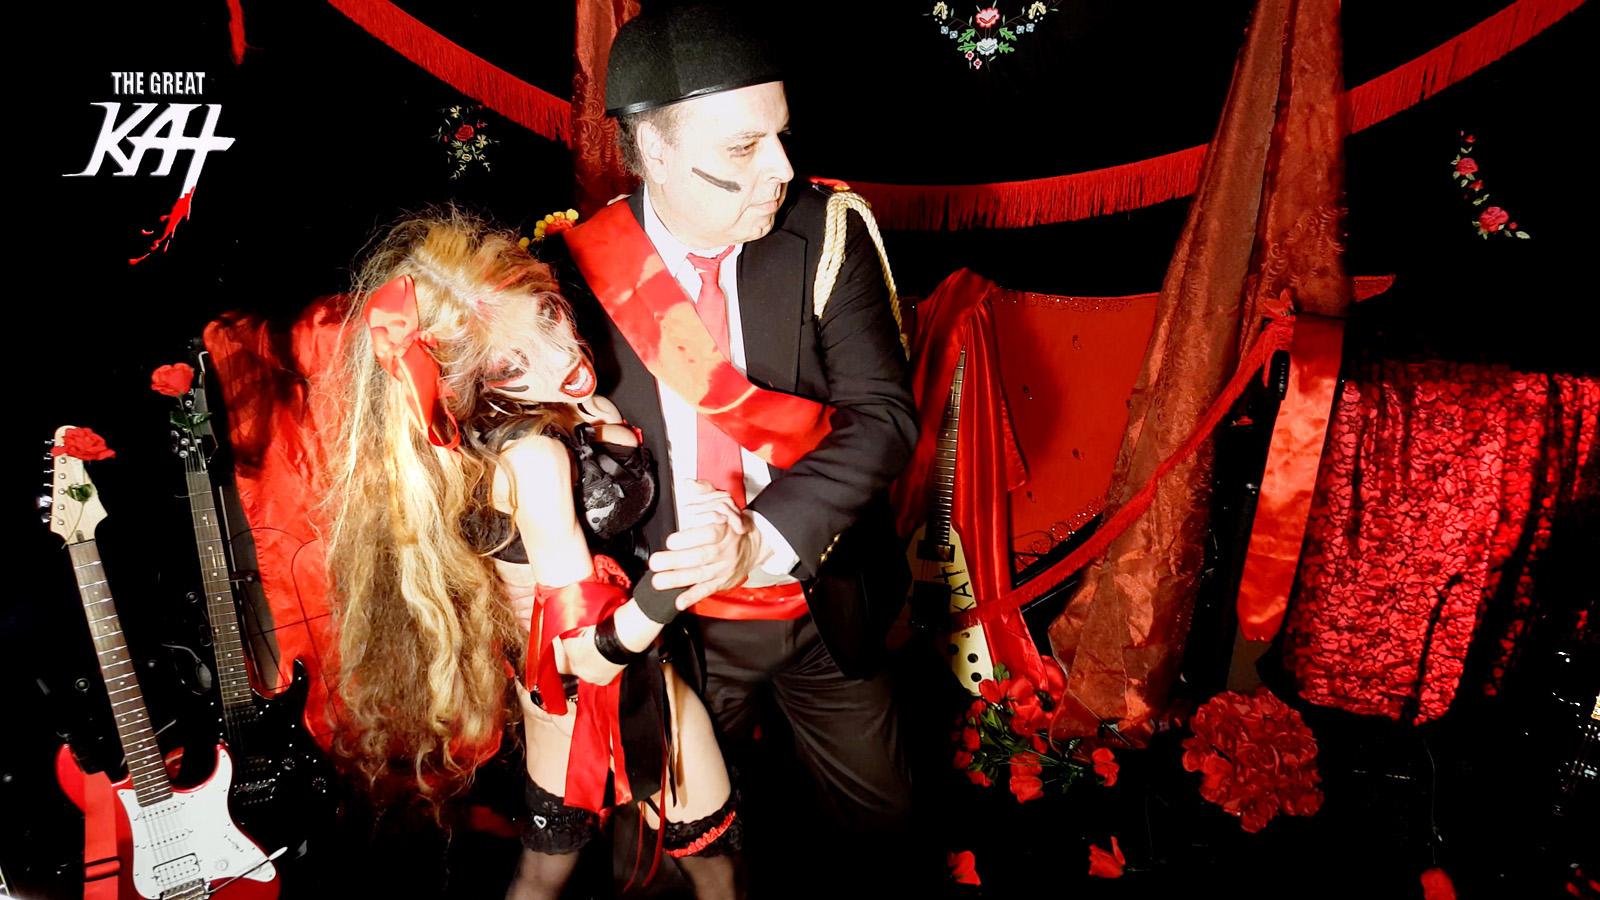 "CARMEN & DON JOSE - The DANCE of SEDUCTION! The Great Kat's SARASATE'S ""CARMEN FANTASY"" MUSIC VIDEO!!"